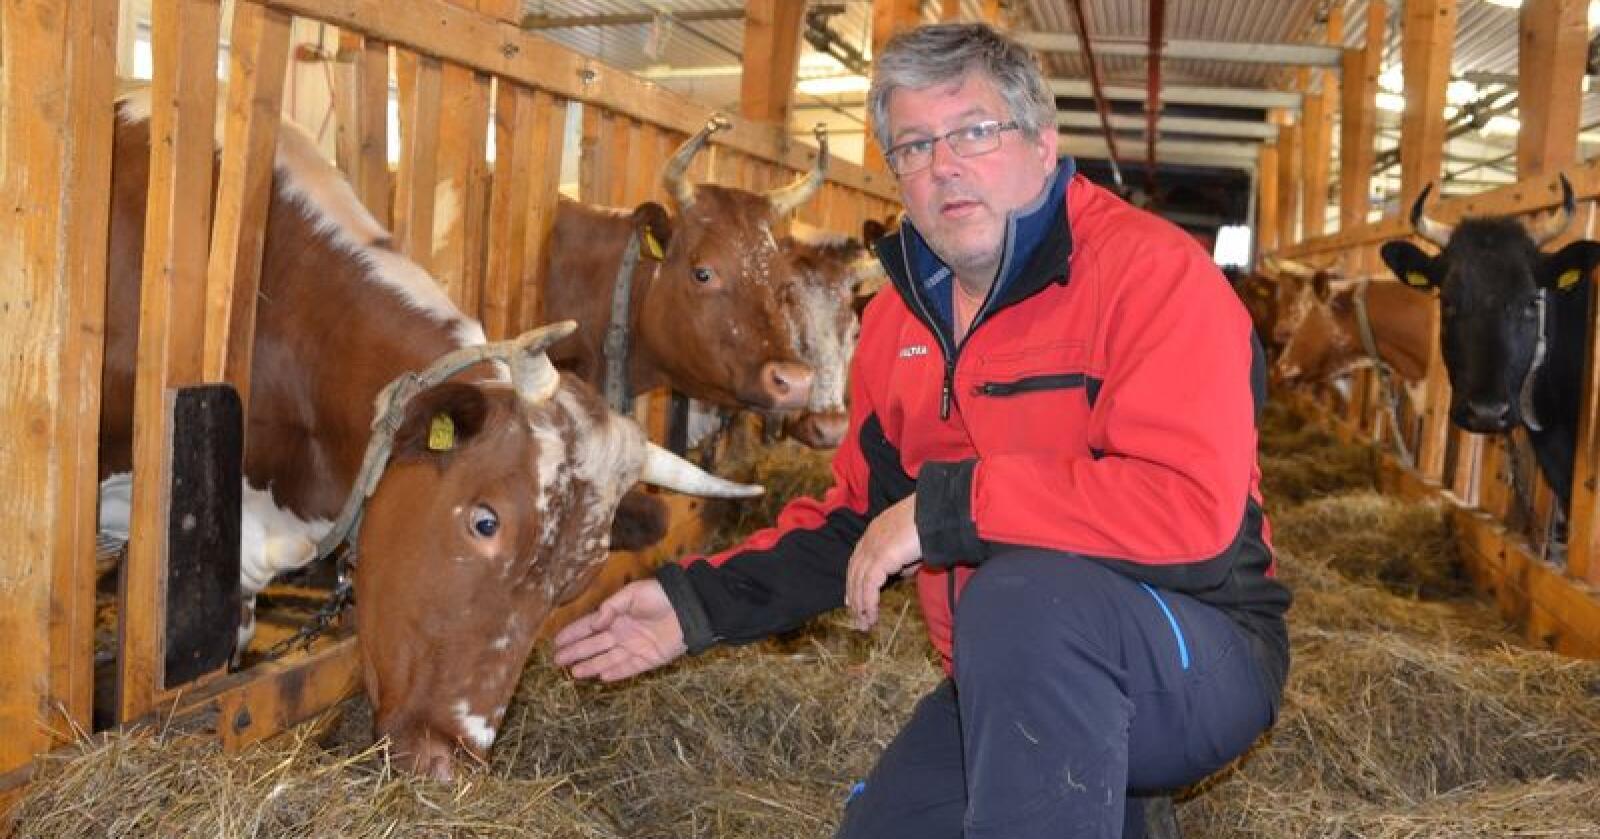 Aslak Snarteland er leder i Telemark Bondelag. (Foto: Arkiv)